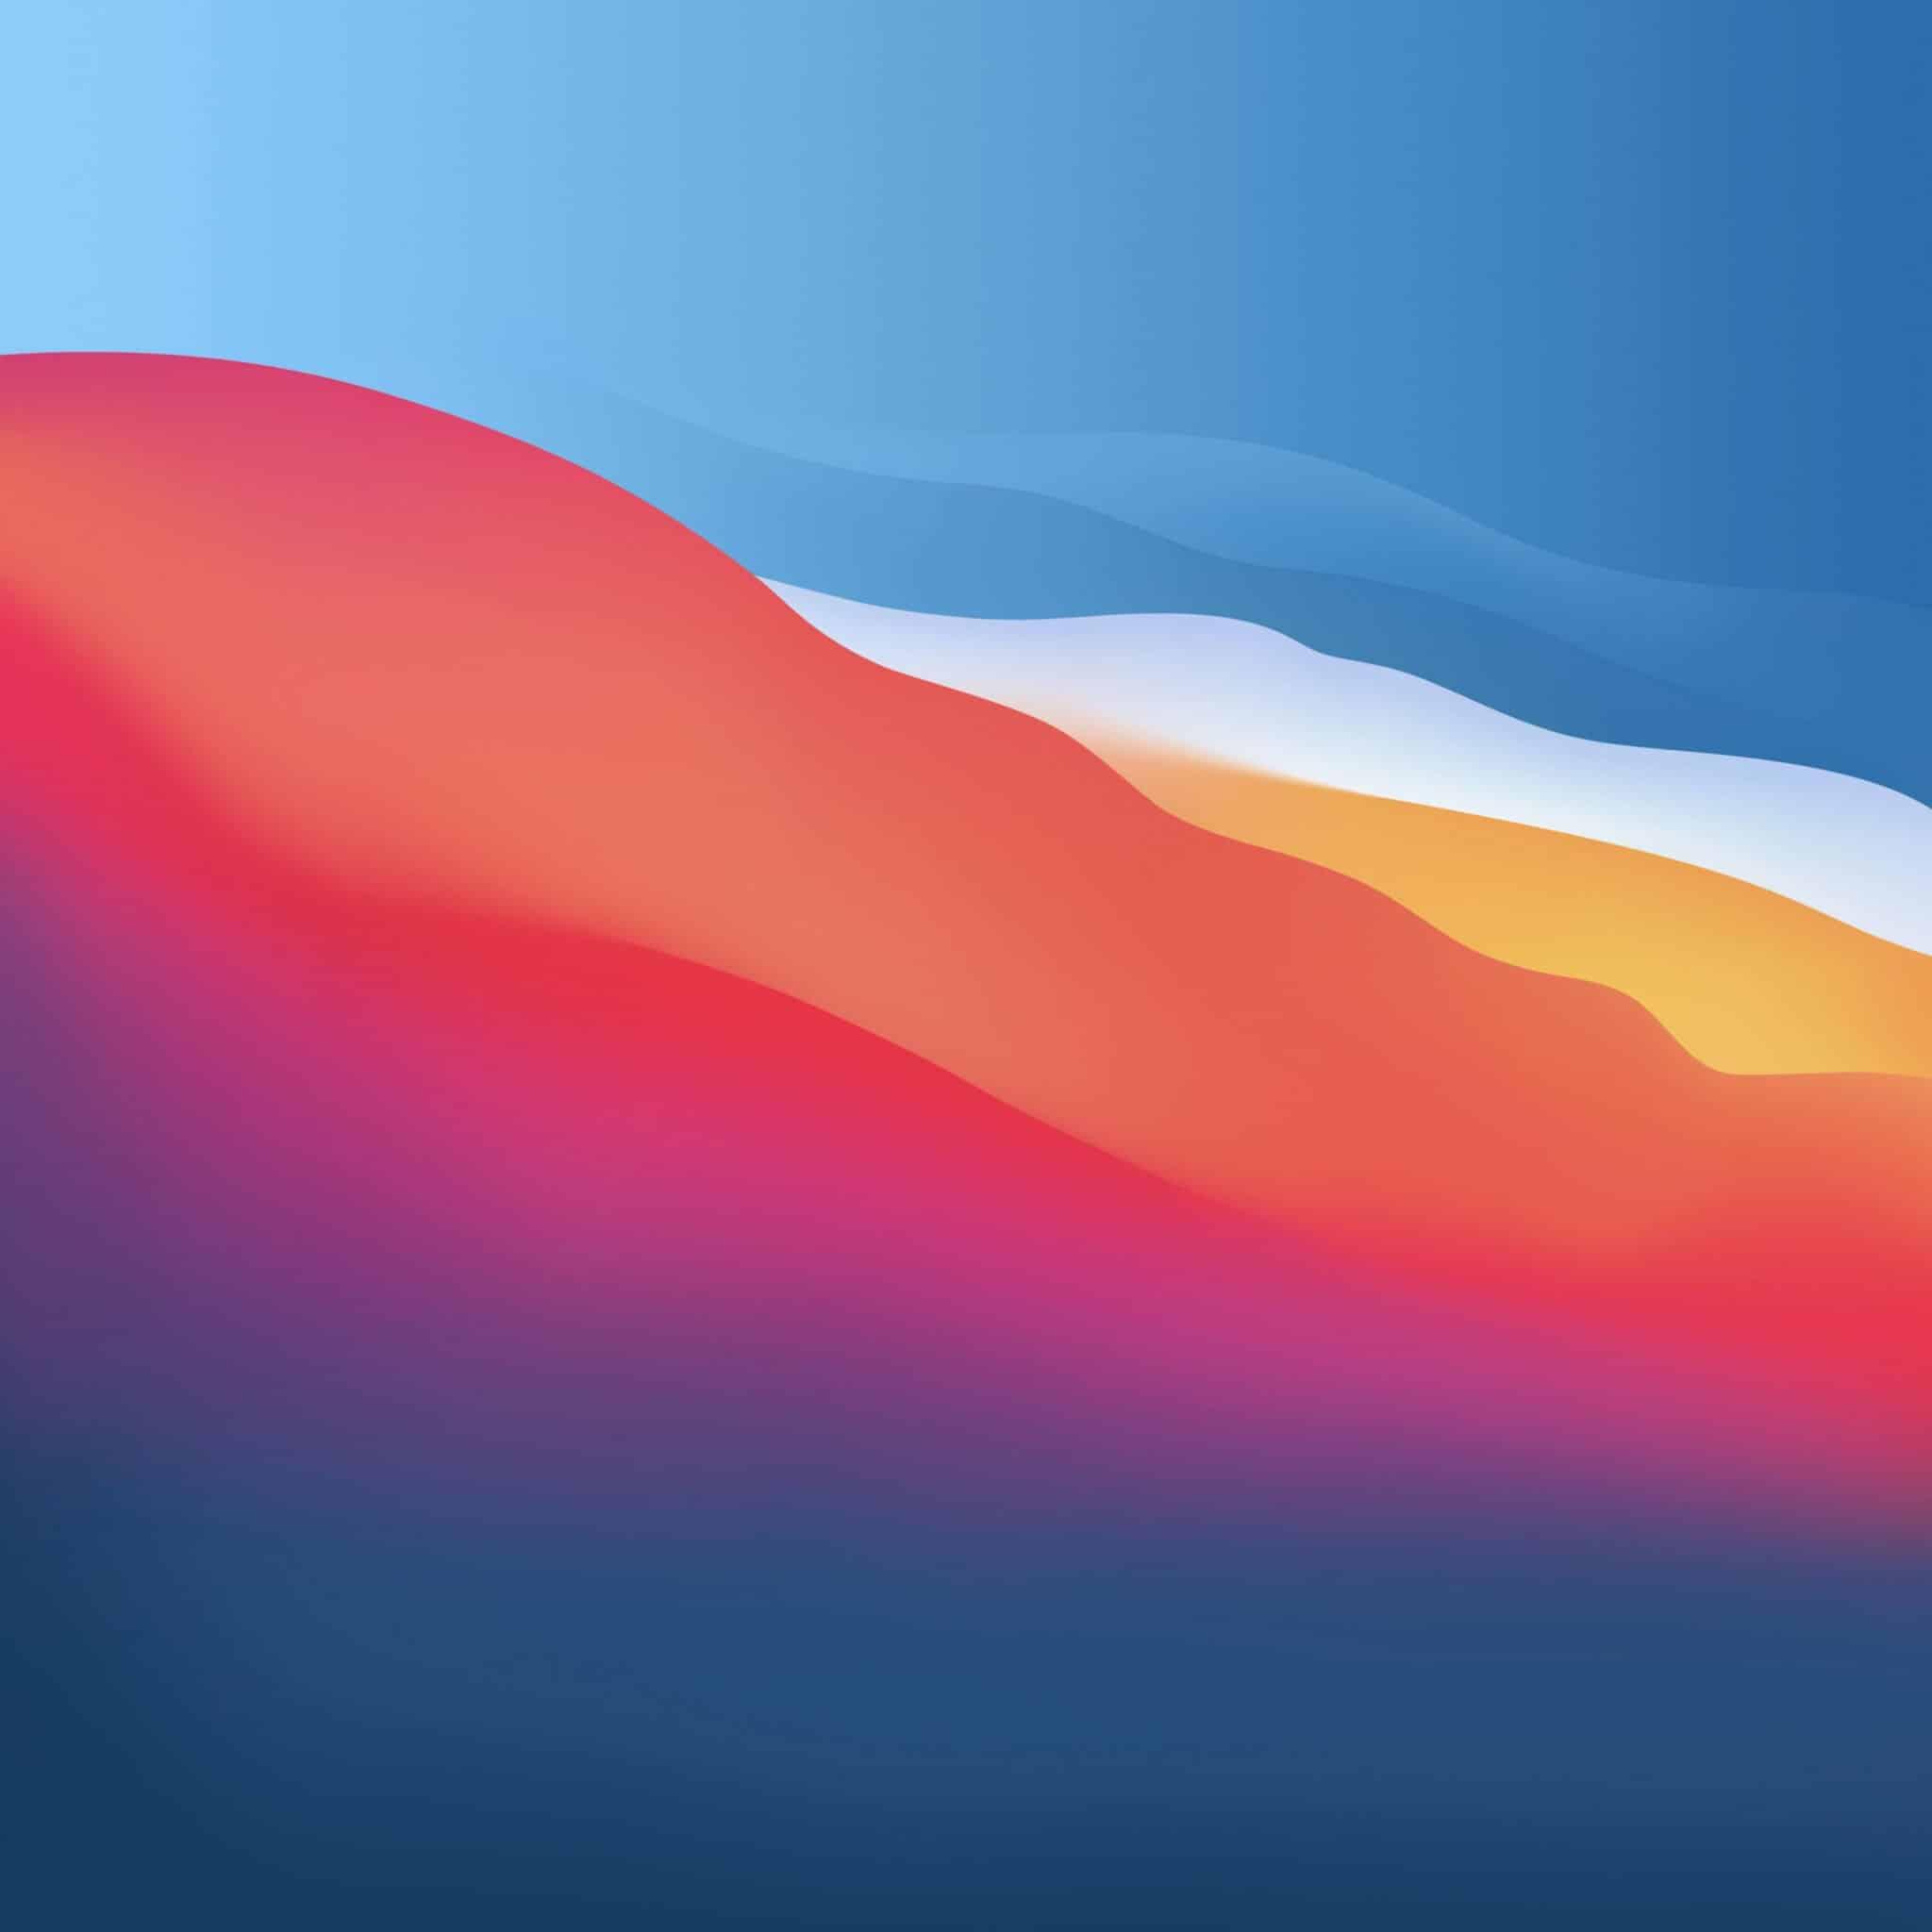 macos big sur vector wave light wallpaper